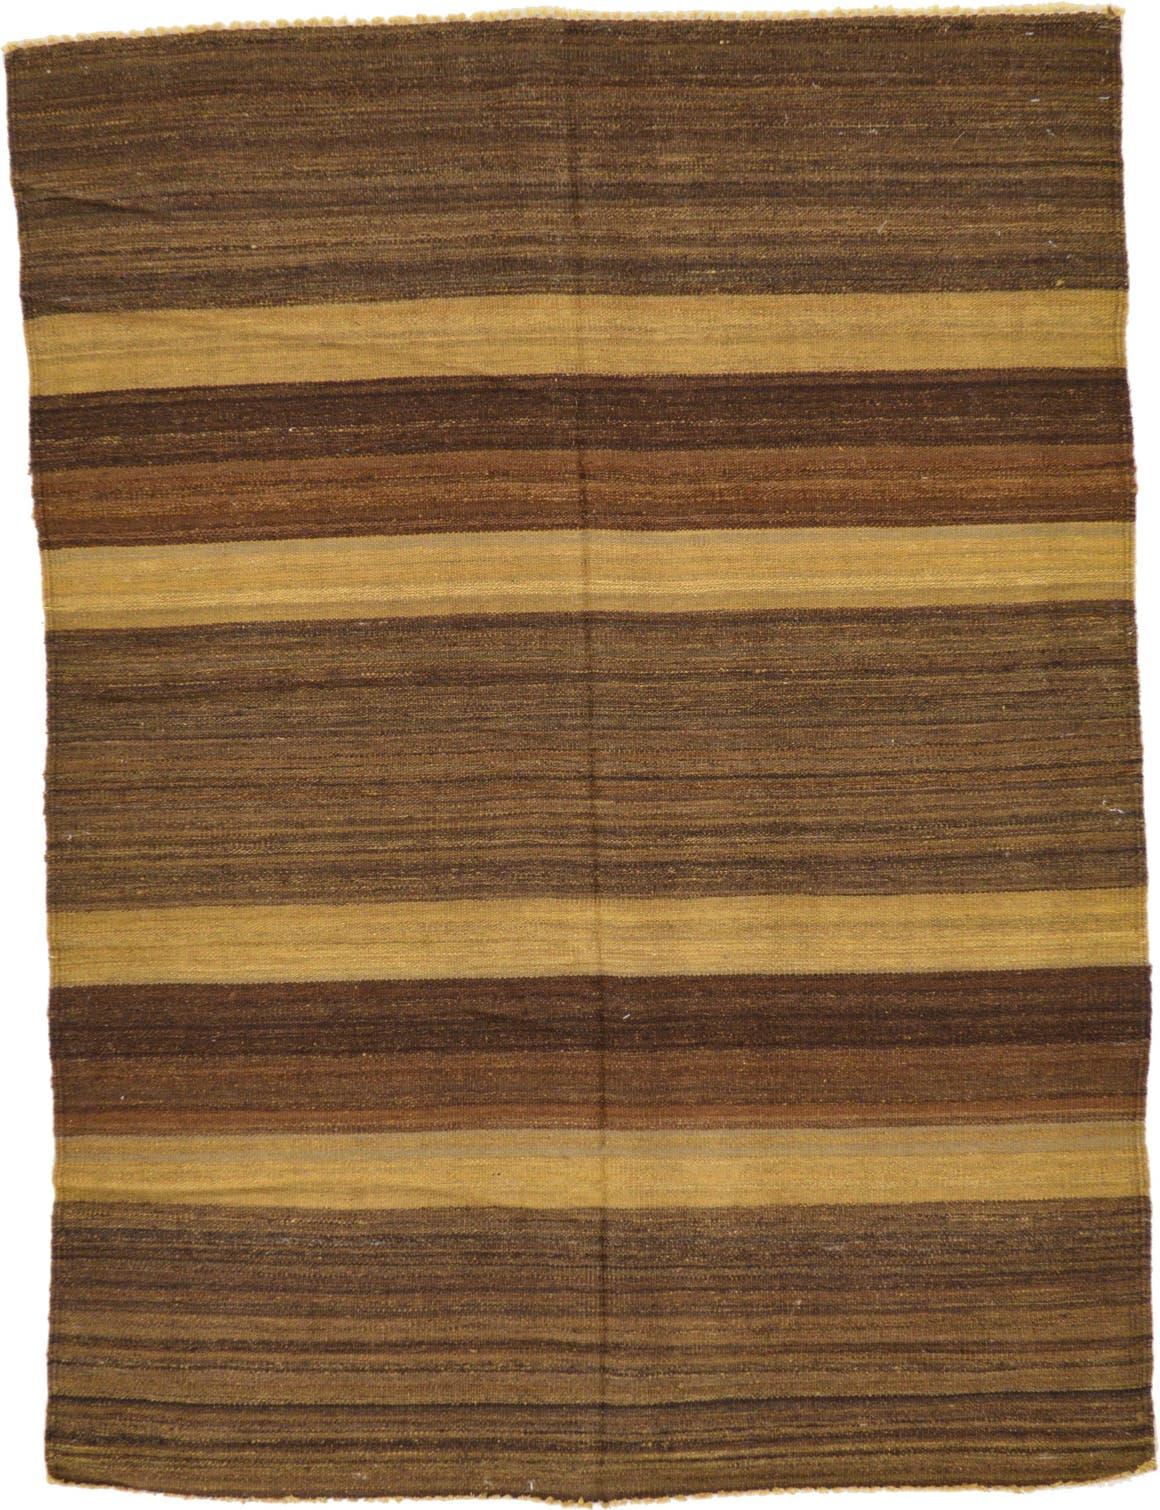 4' 2 x 5' 7 Striped Modern Kilim Rug main image